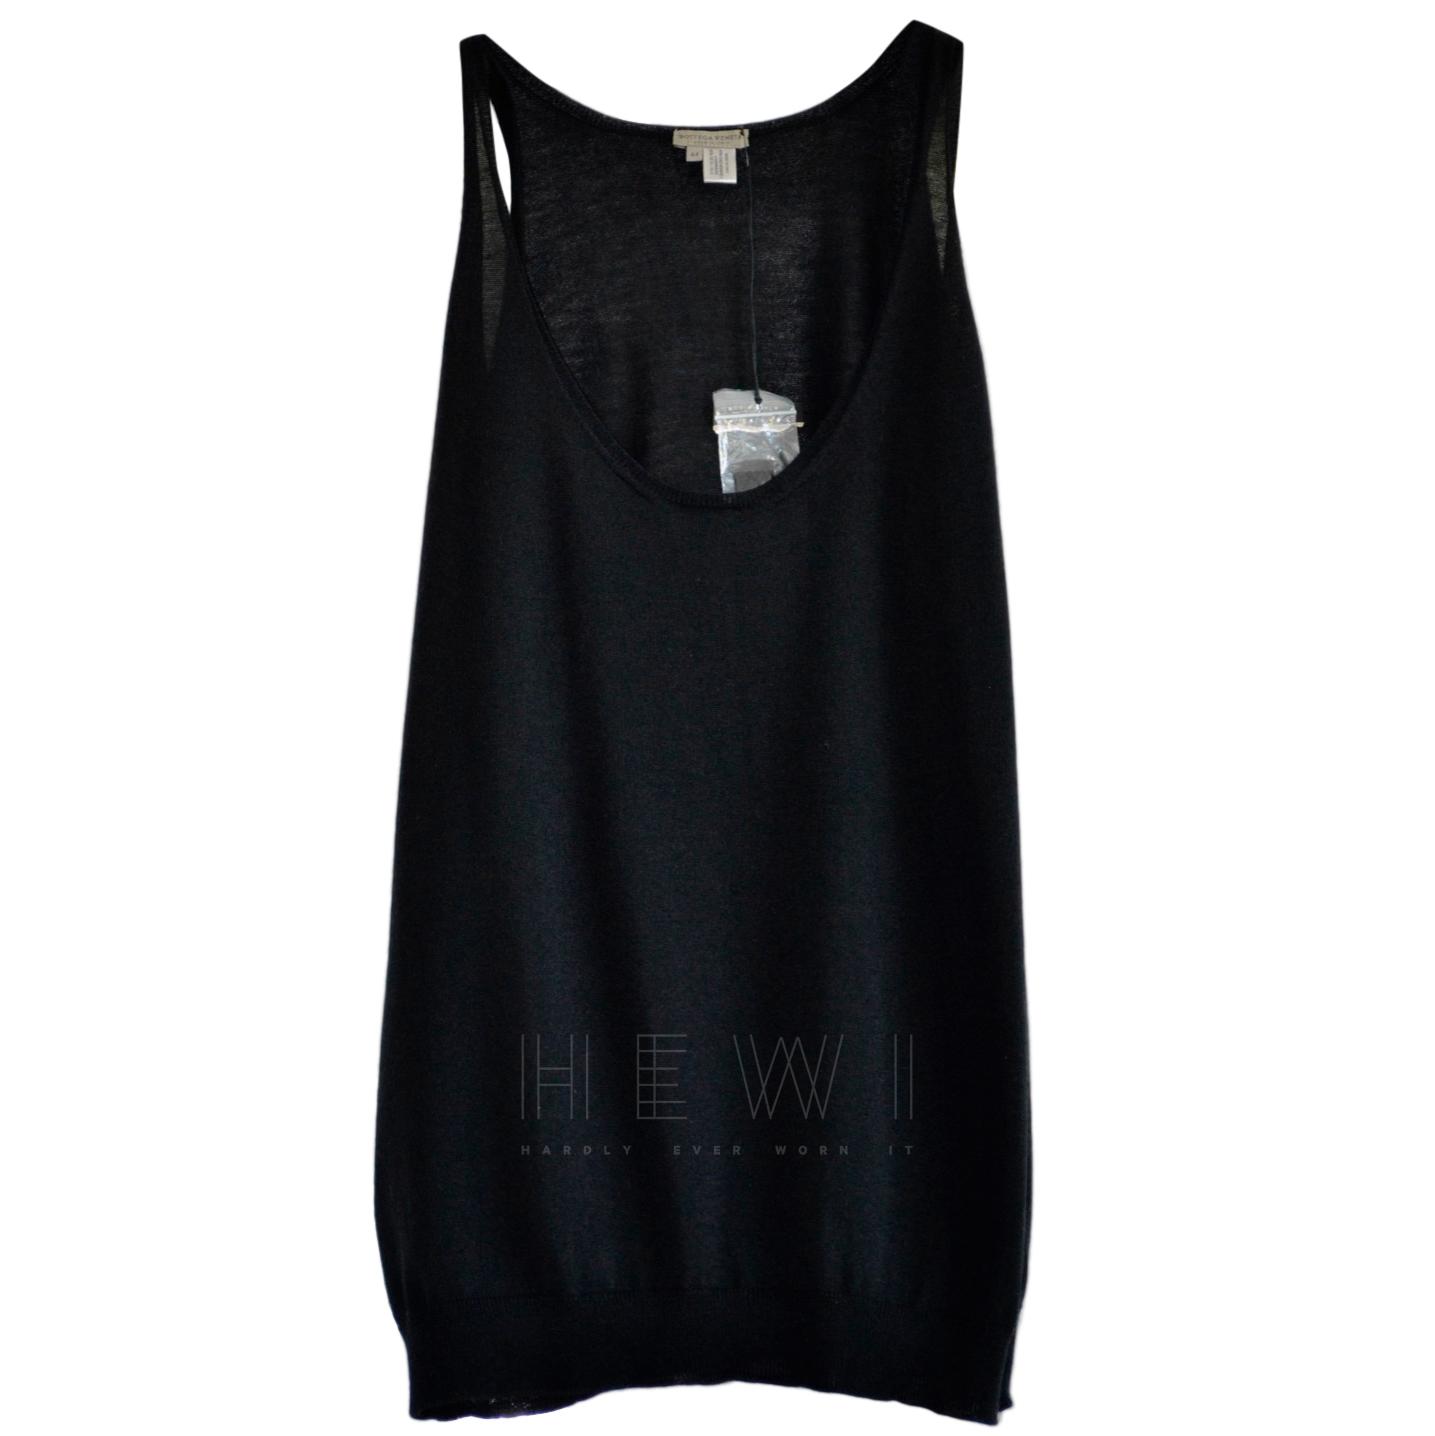 Bottega Veneta black sleeveless cashmere sweater